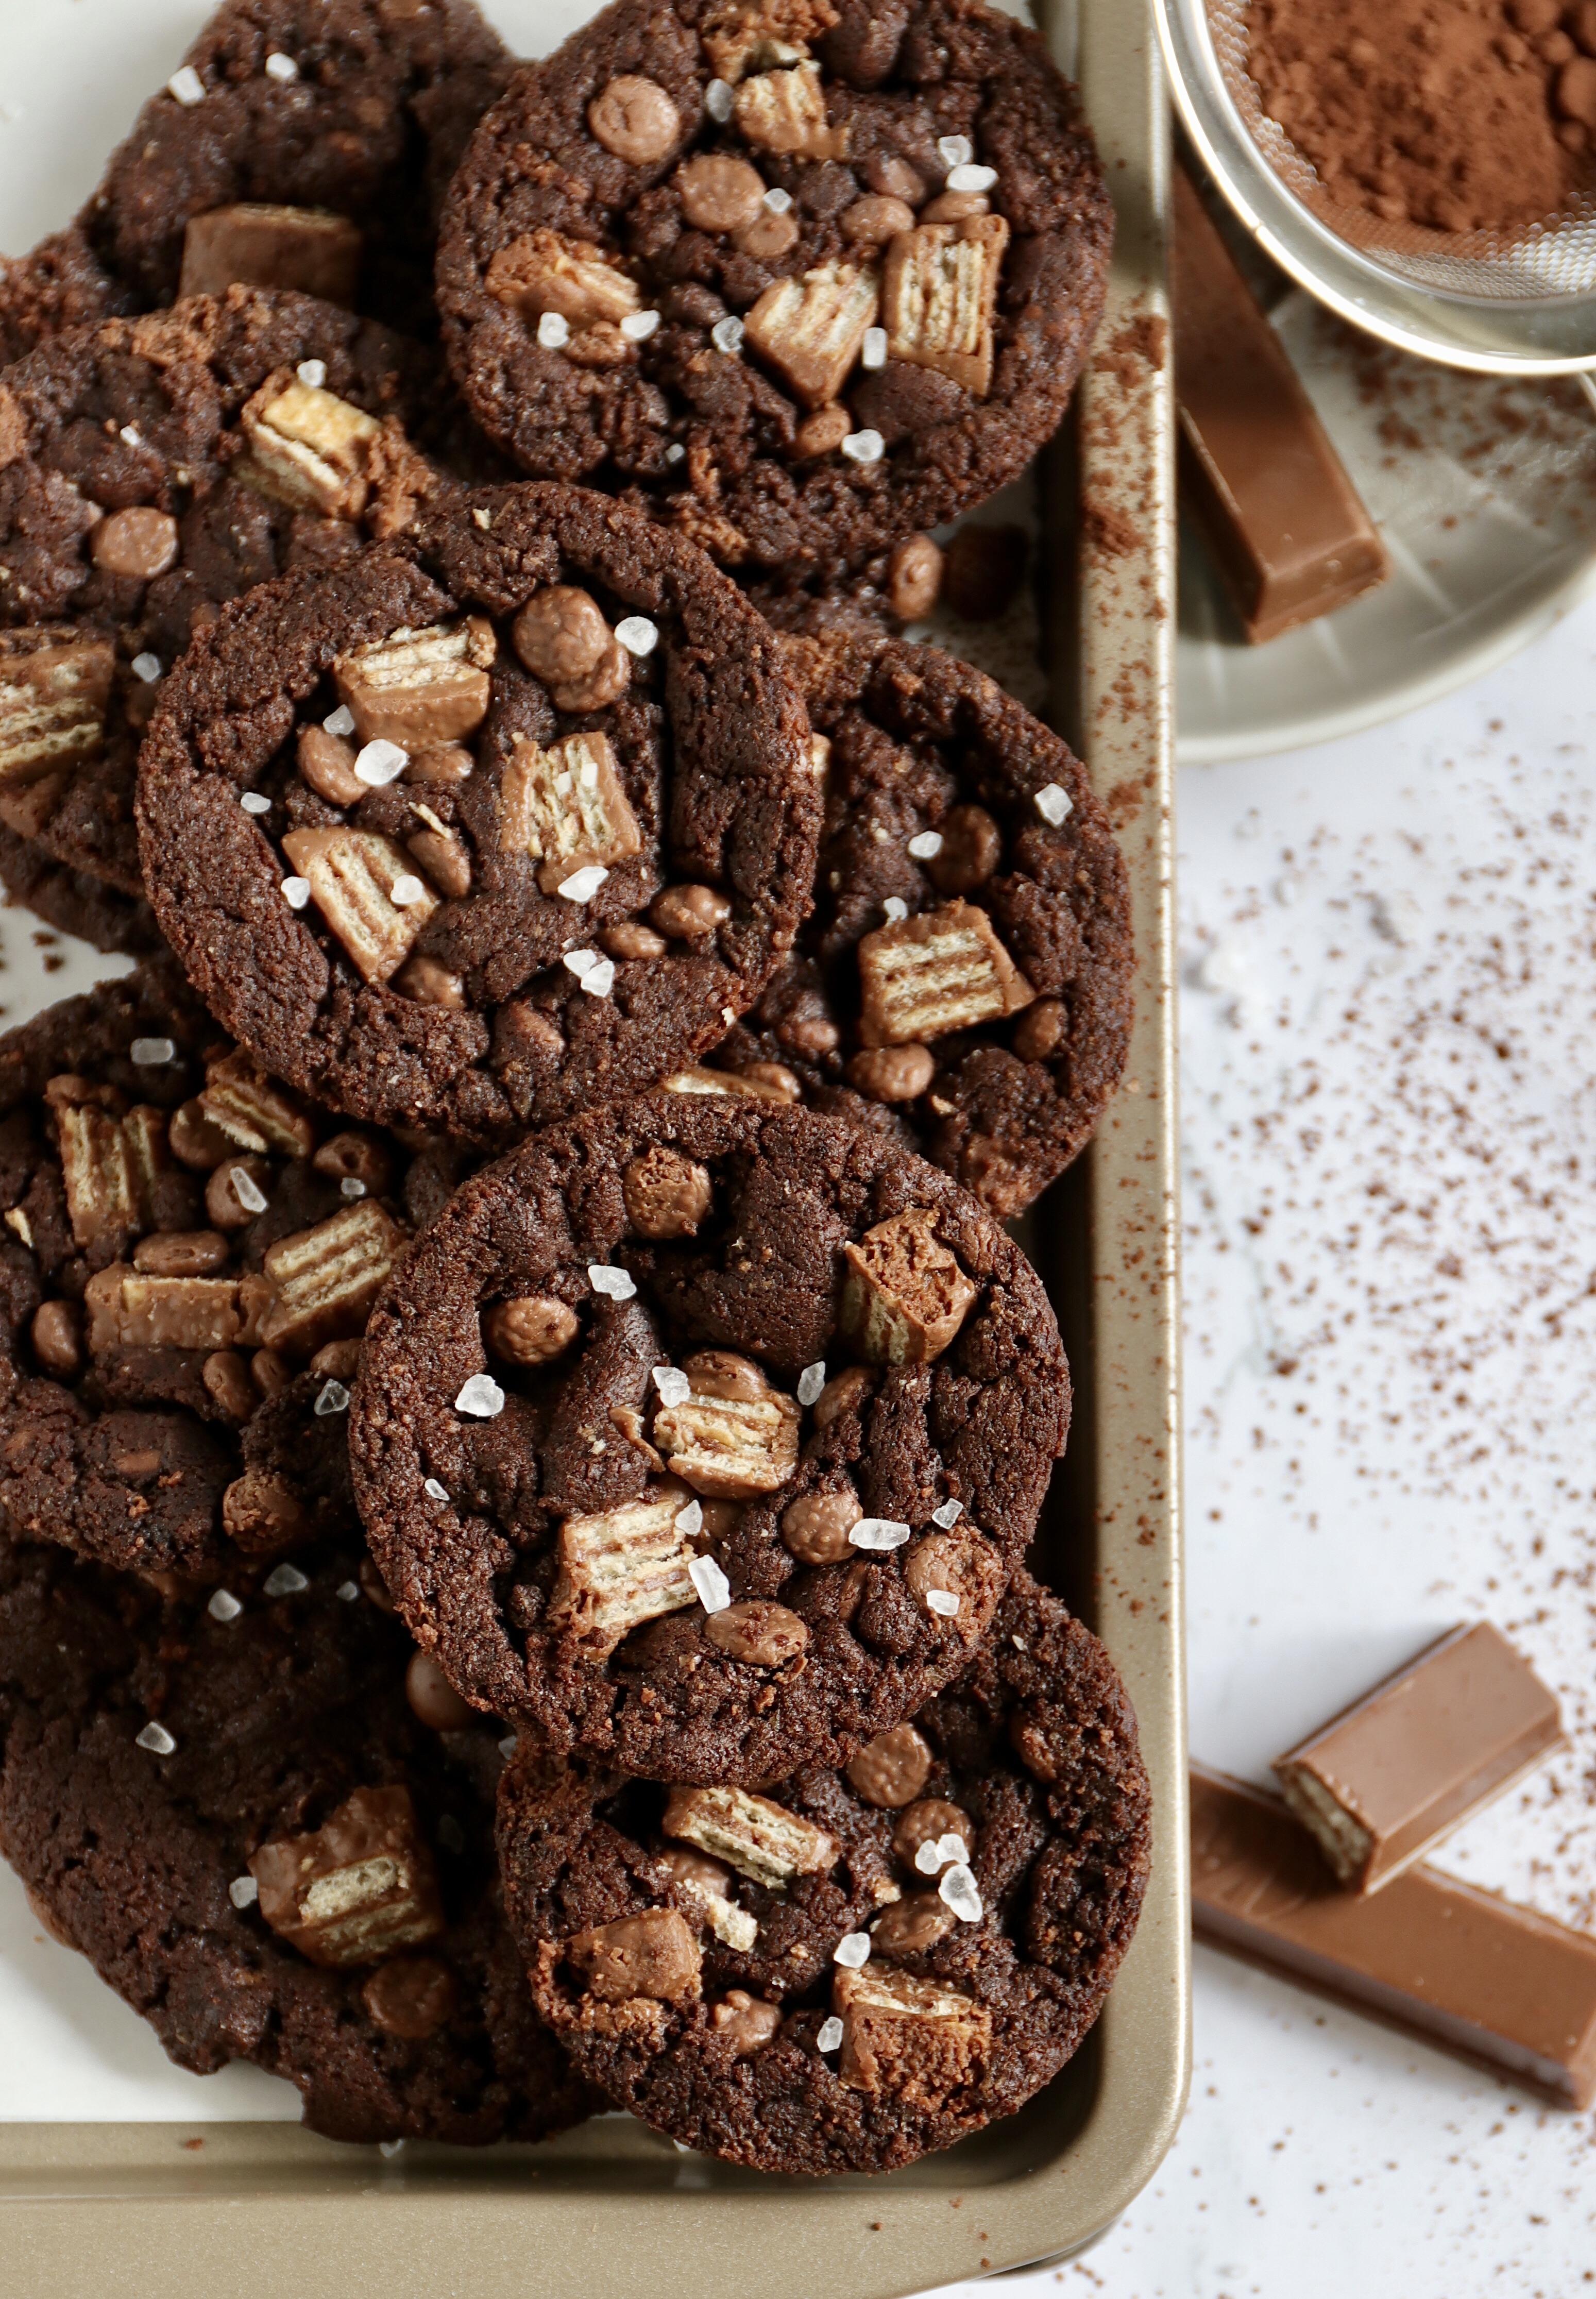 Rezept für Chocolate Chip Cookies mit KitKat